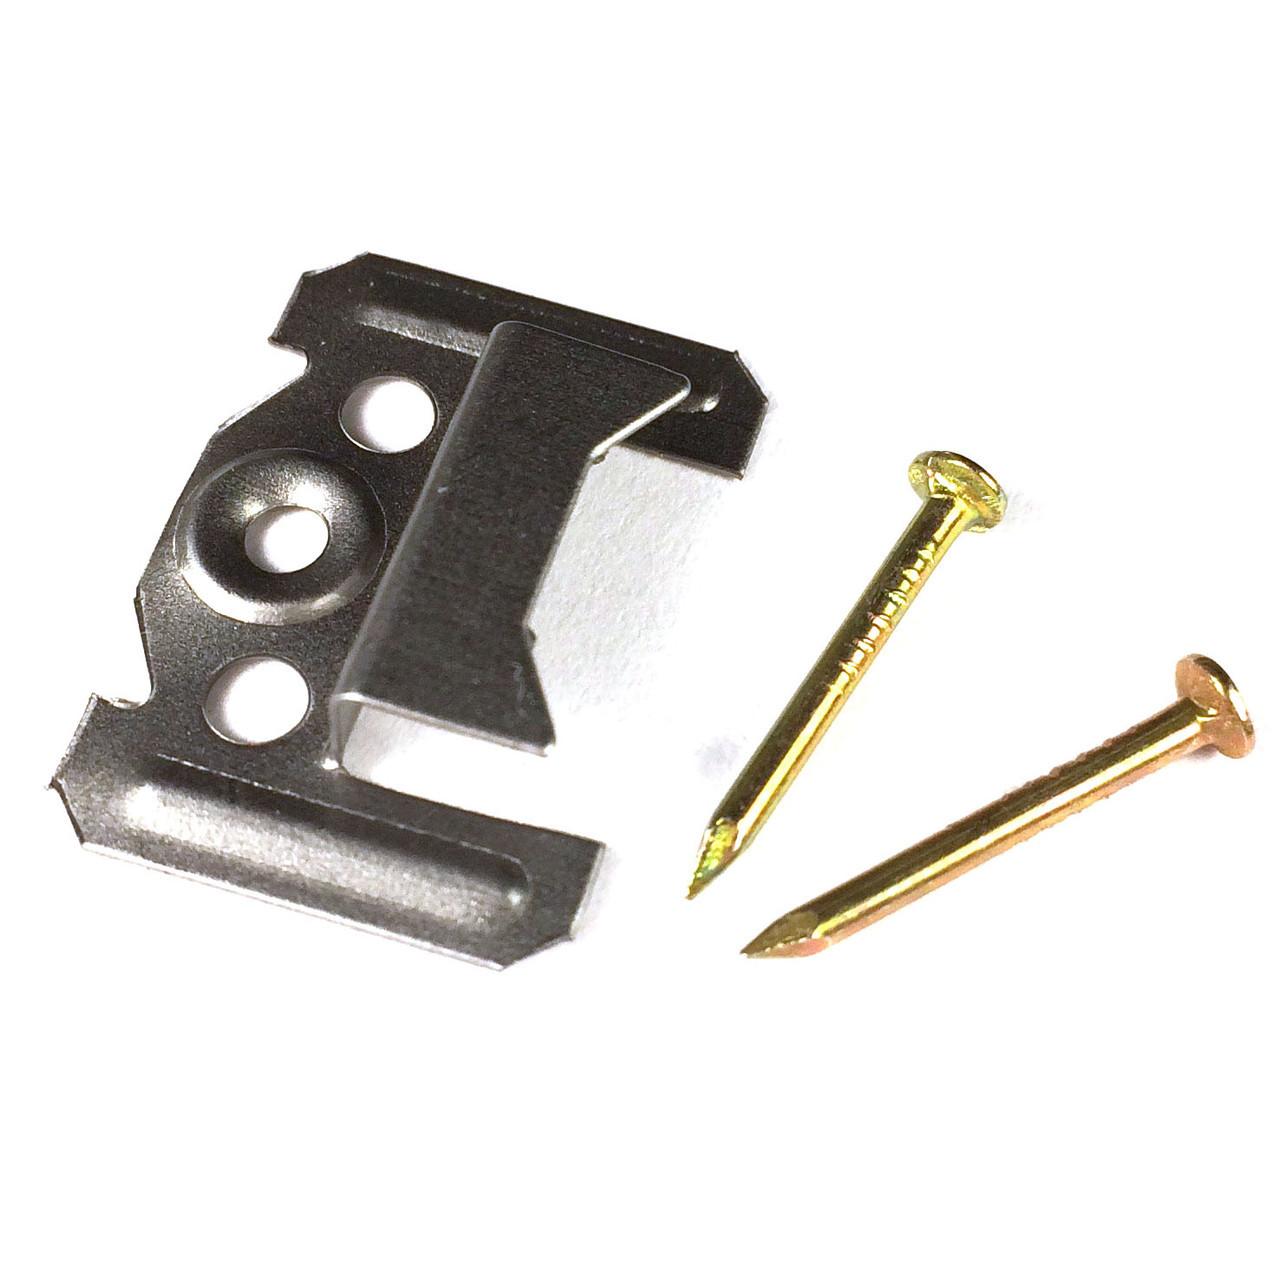 Кляймер (кляммер) для крепления вагонки 1.0 мм., 100 шт.